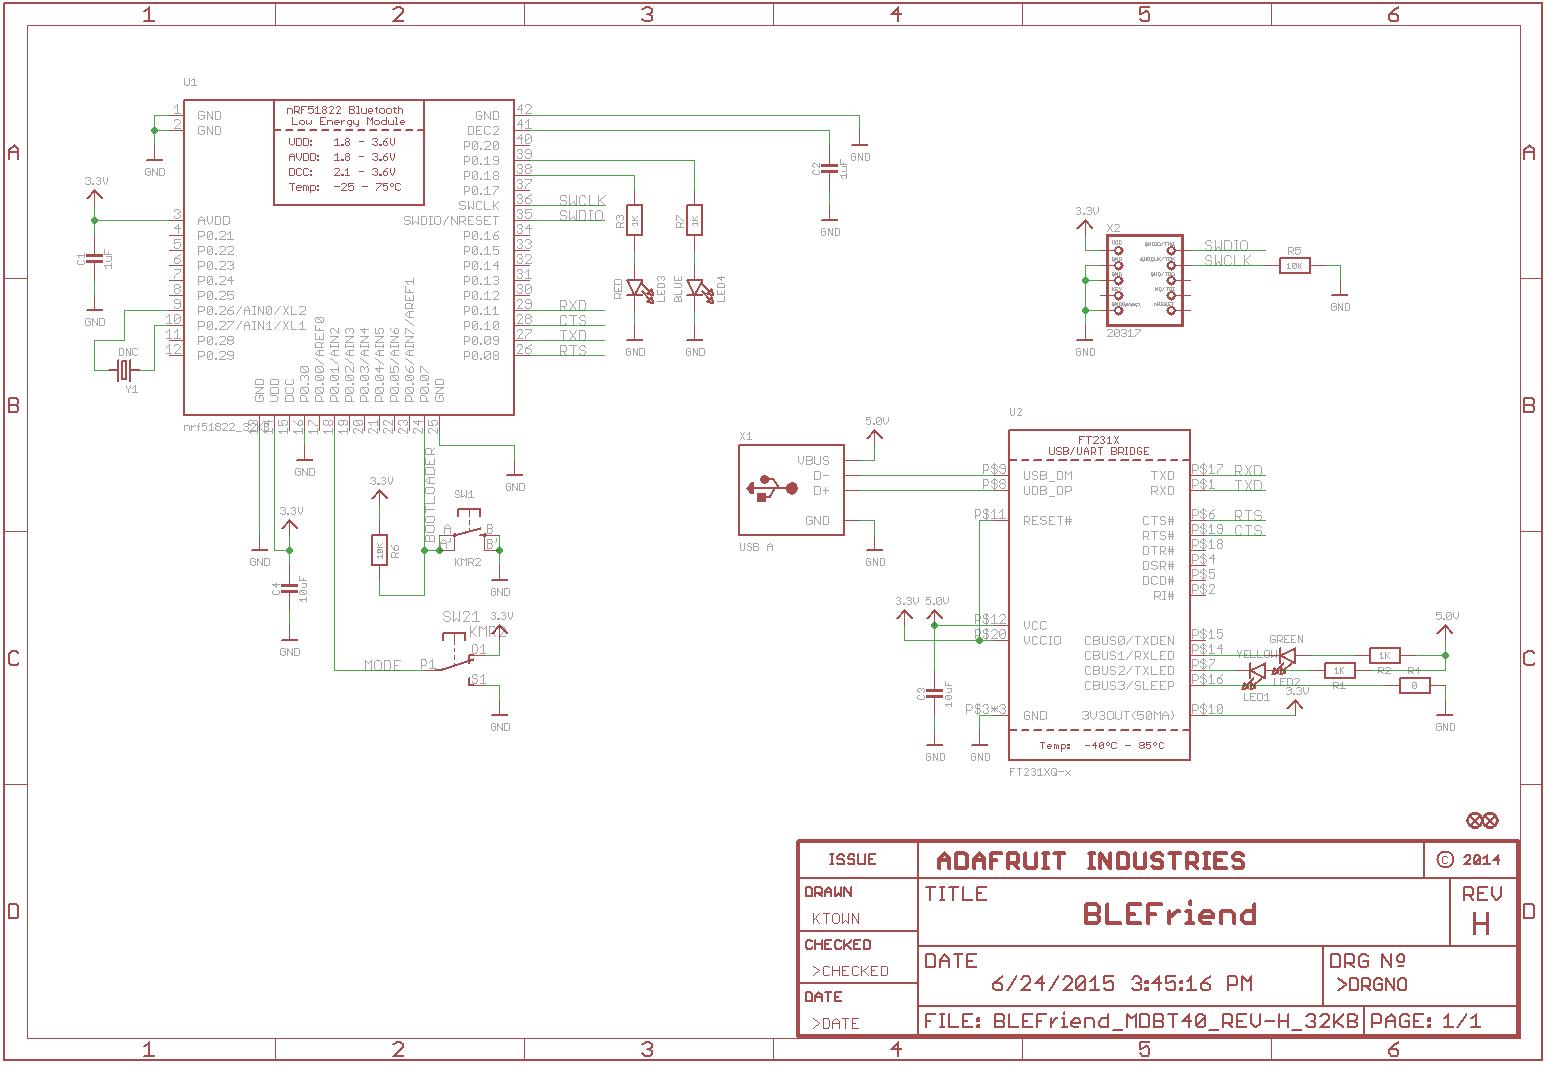 Bluefruit LE Sniffer - Bluetooth Low Energy (BLE 4 0) - nRF51822 - v1 0  (ID: 2269)